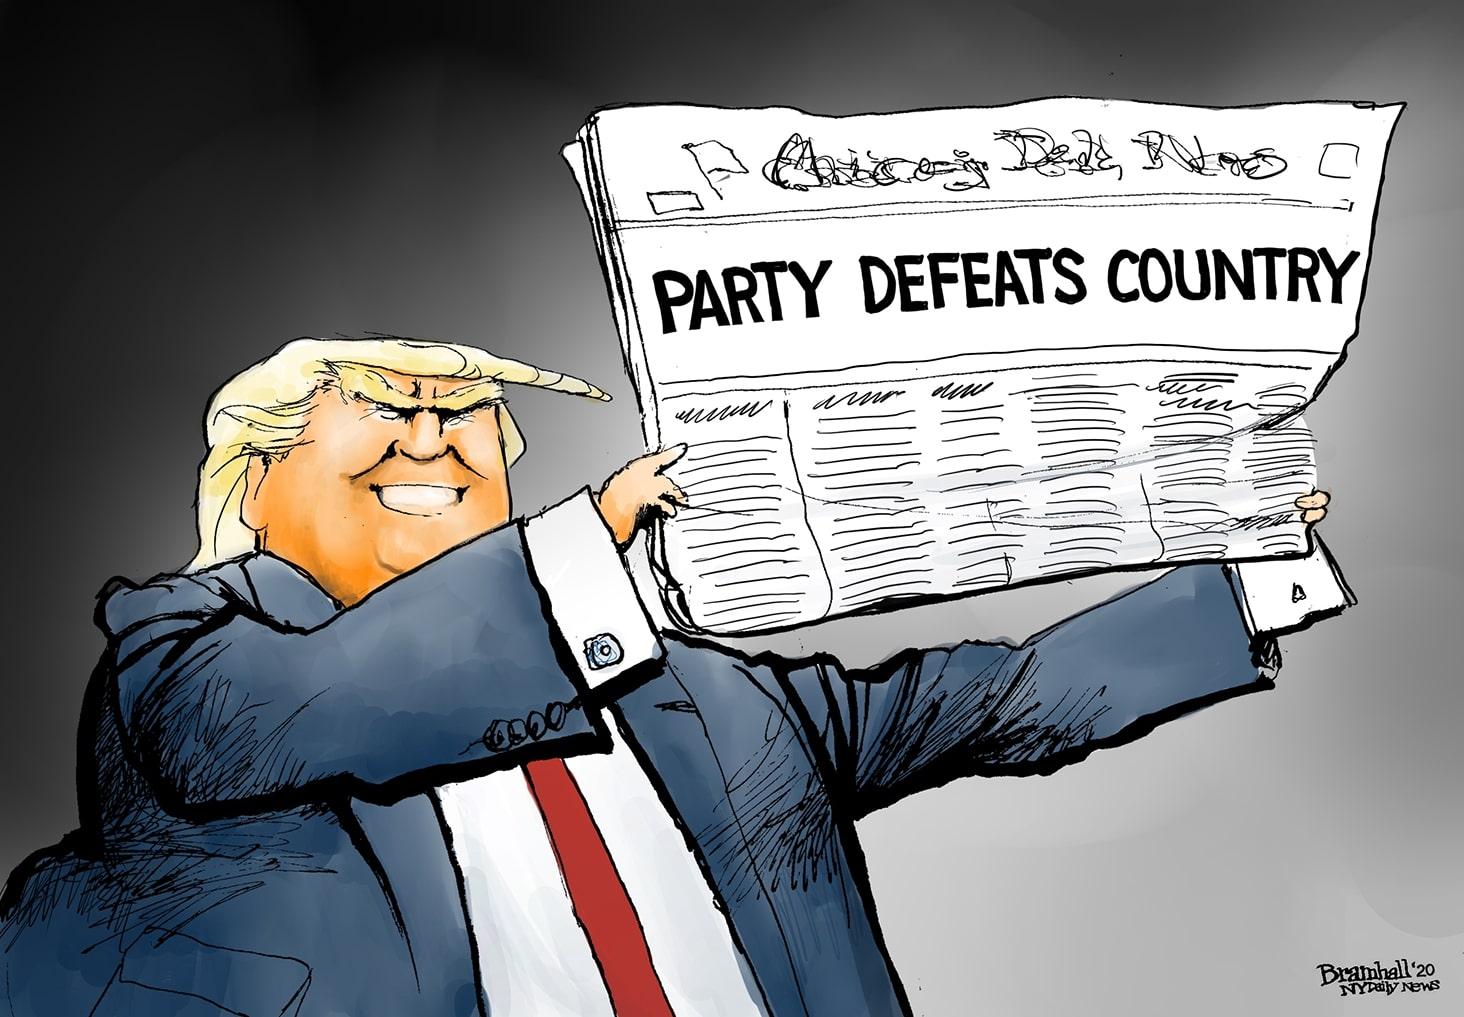 Political cartoons - the 'funny' pics thread.-13_53-jpg